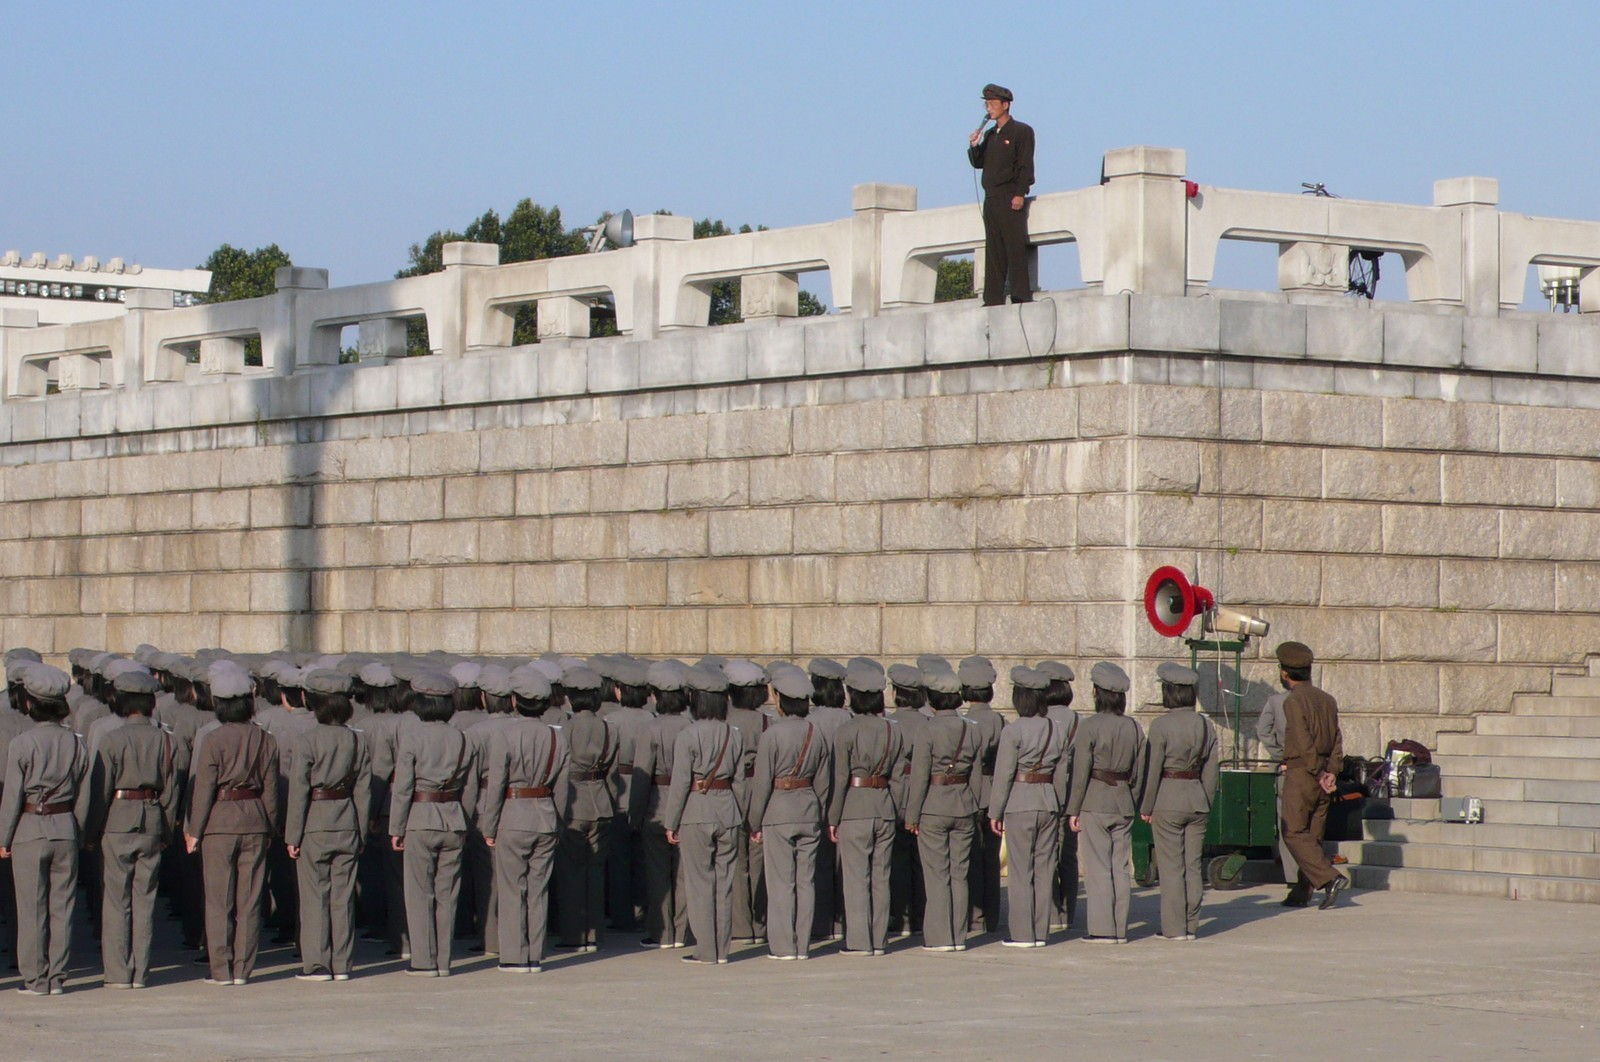 Young women at drill, Pyongyang